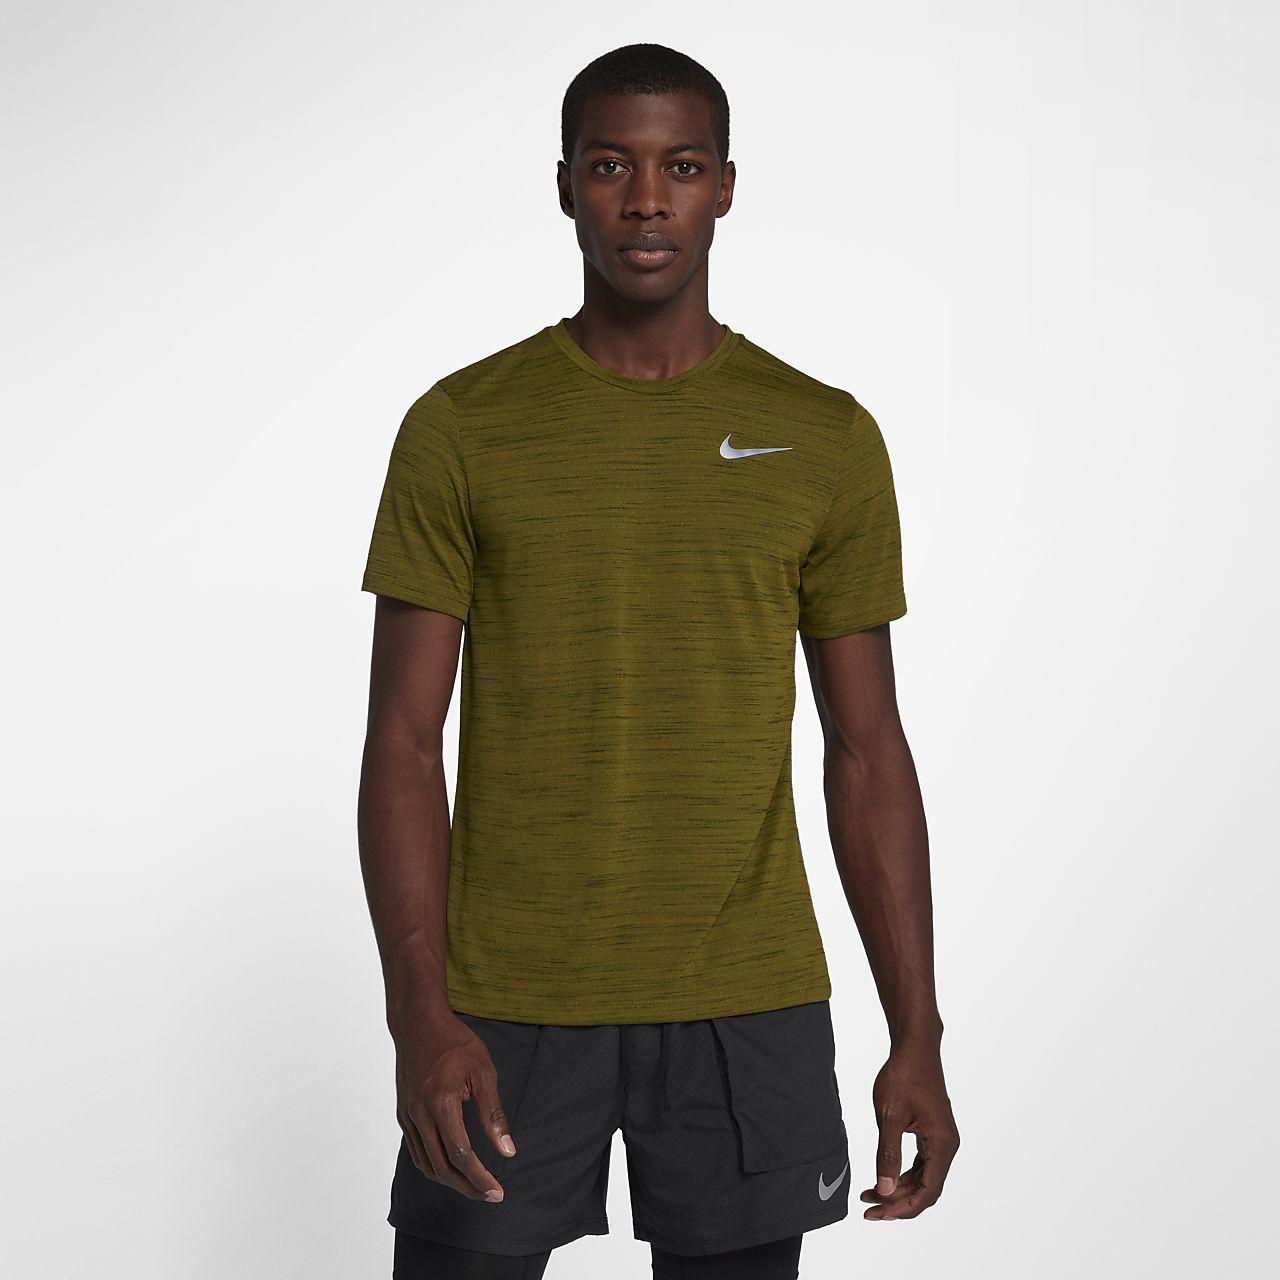 Nike Miler Essential Men's Short-Sleeve Running Top